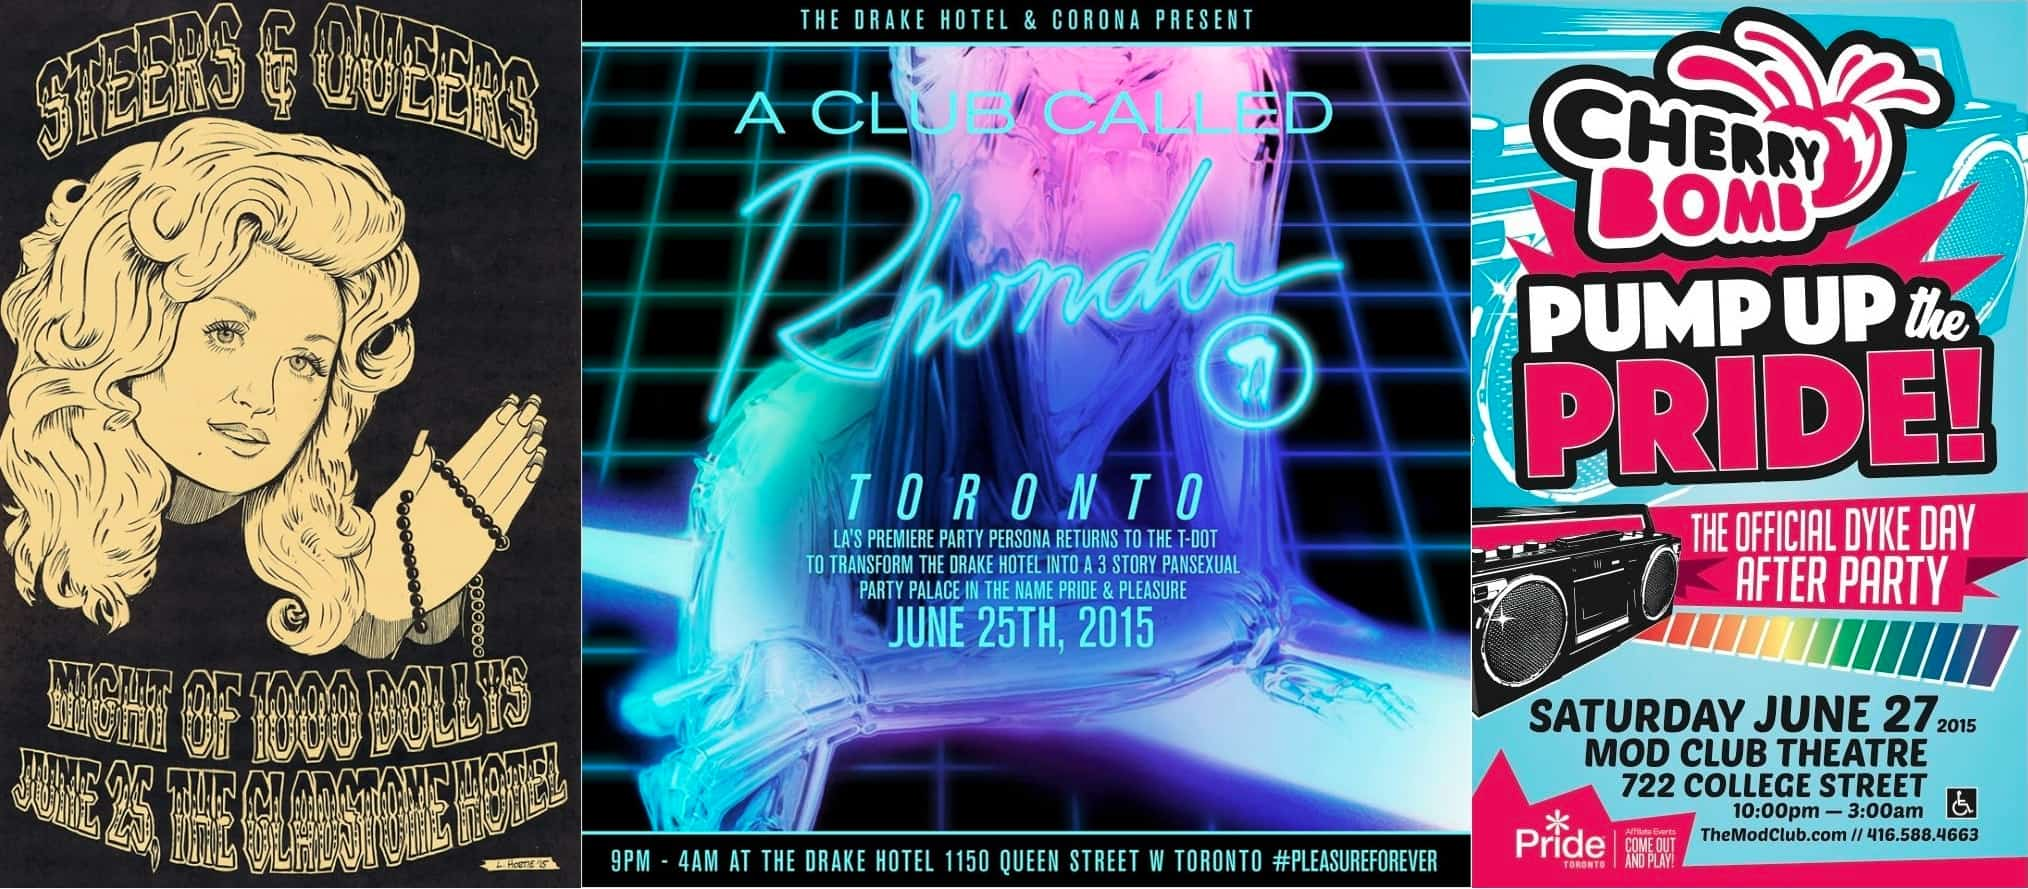 Your 2015 Toronto Pride Guide